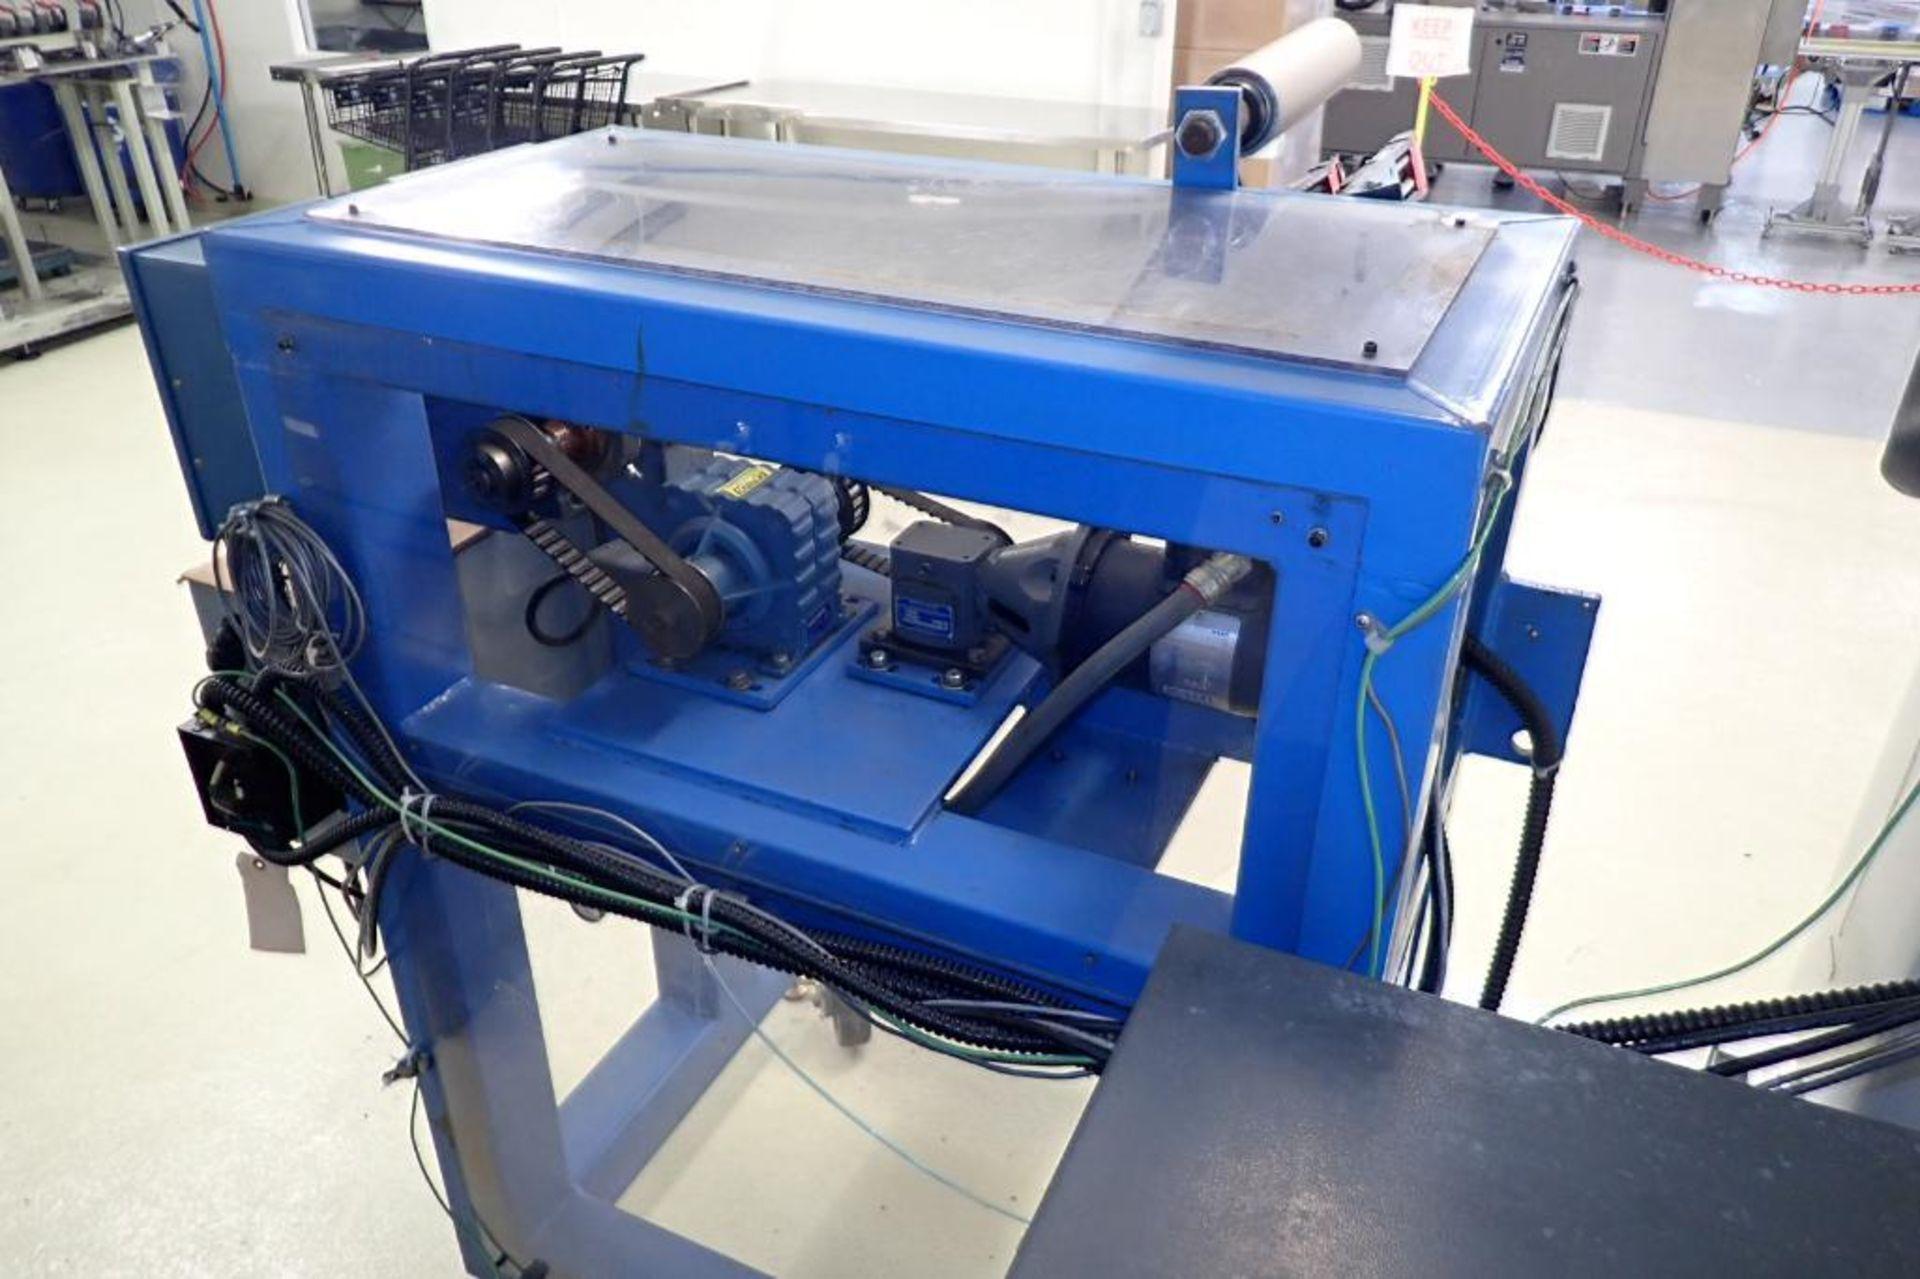 Lot 14 - Control Dynamics nip roll and bond drive, bonding/coating machine, 14 in. wide rolls, not